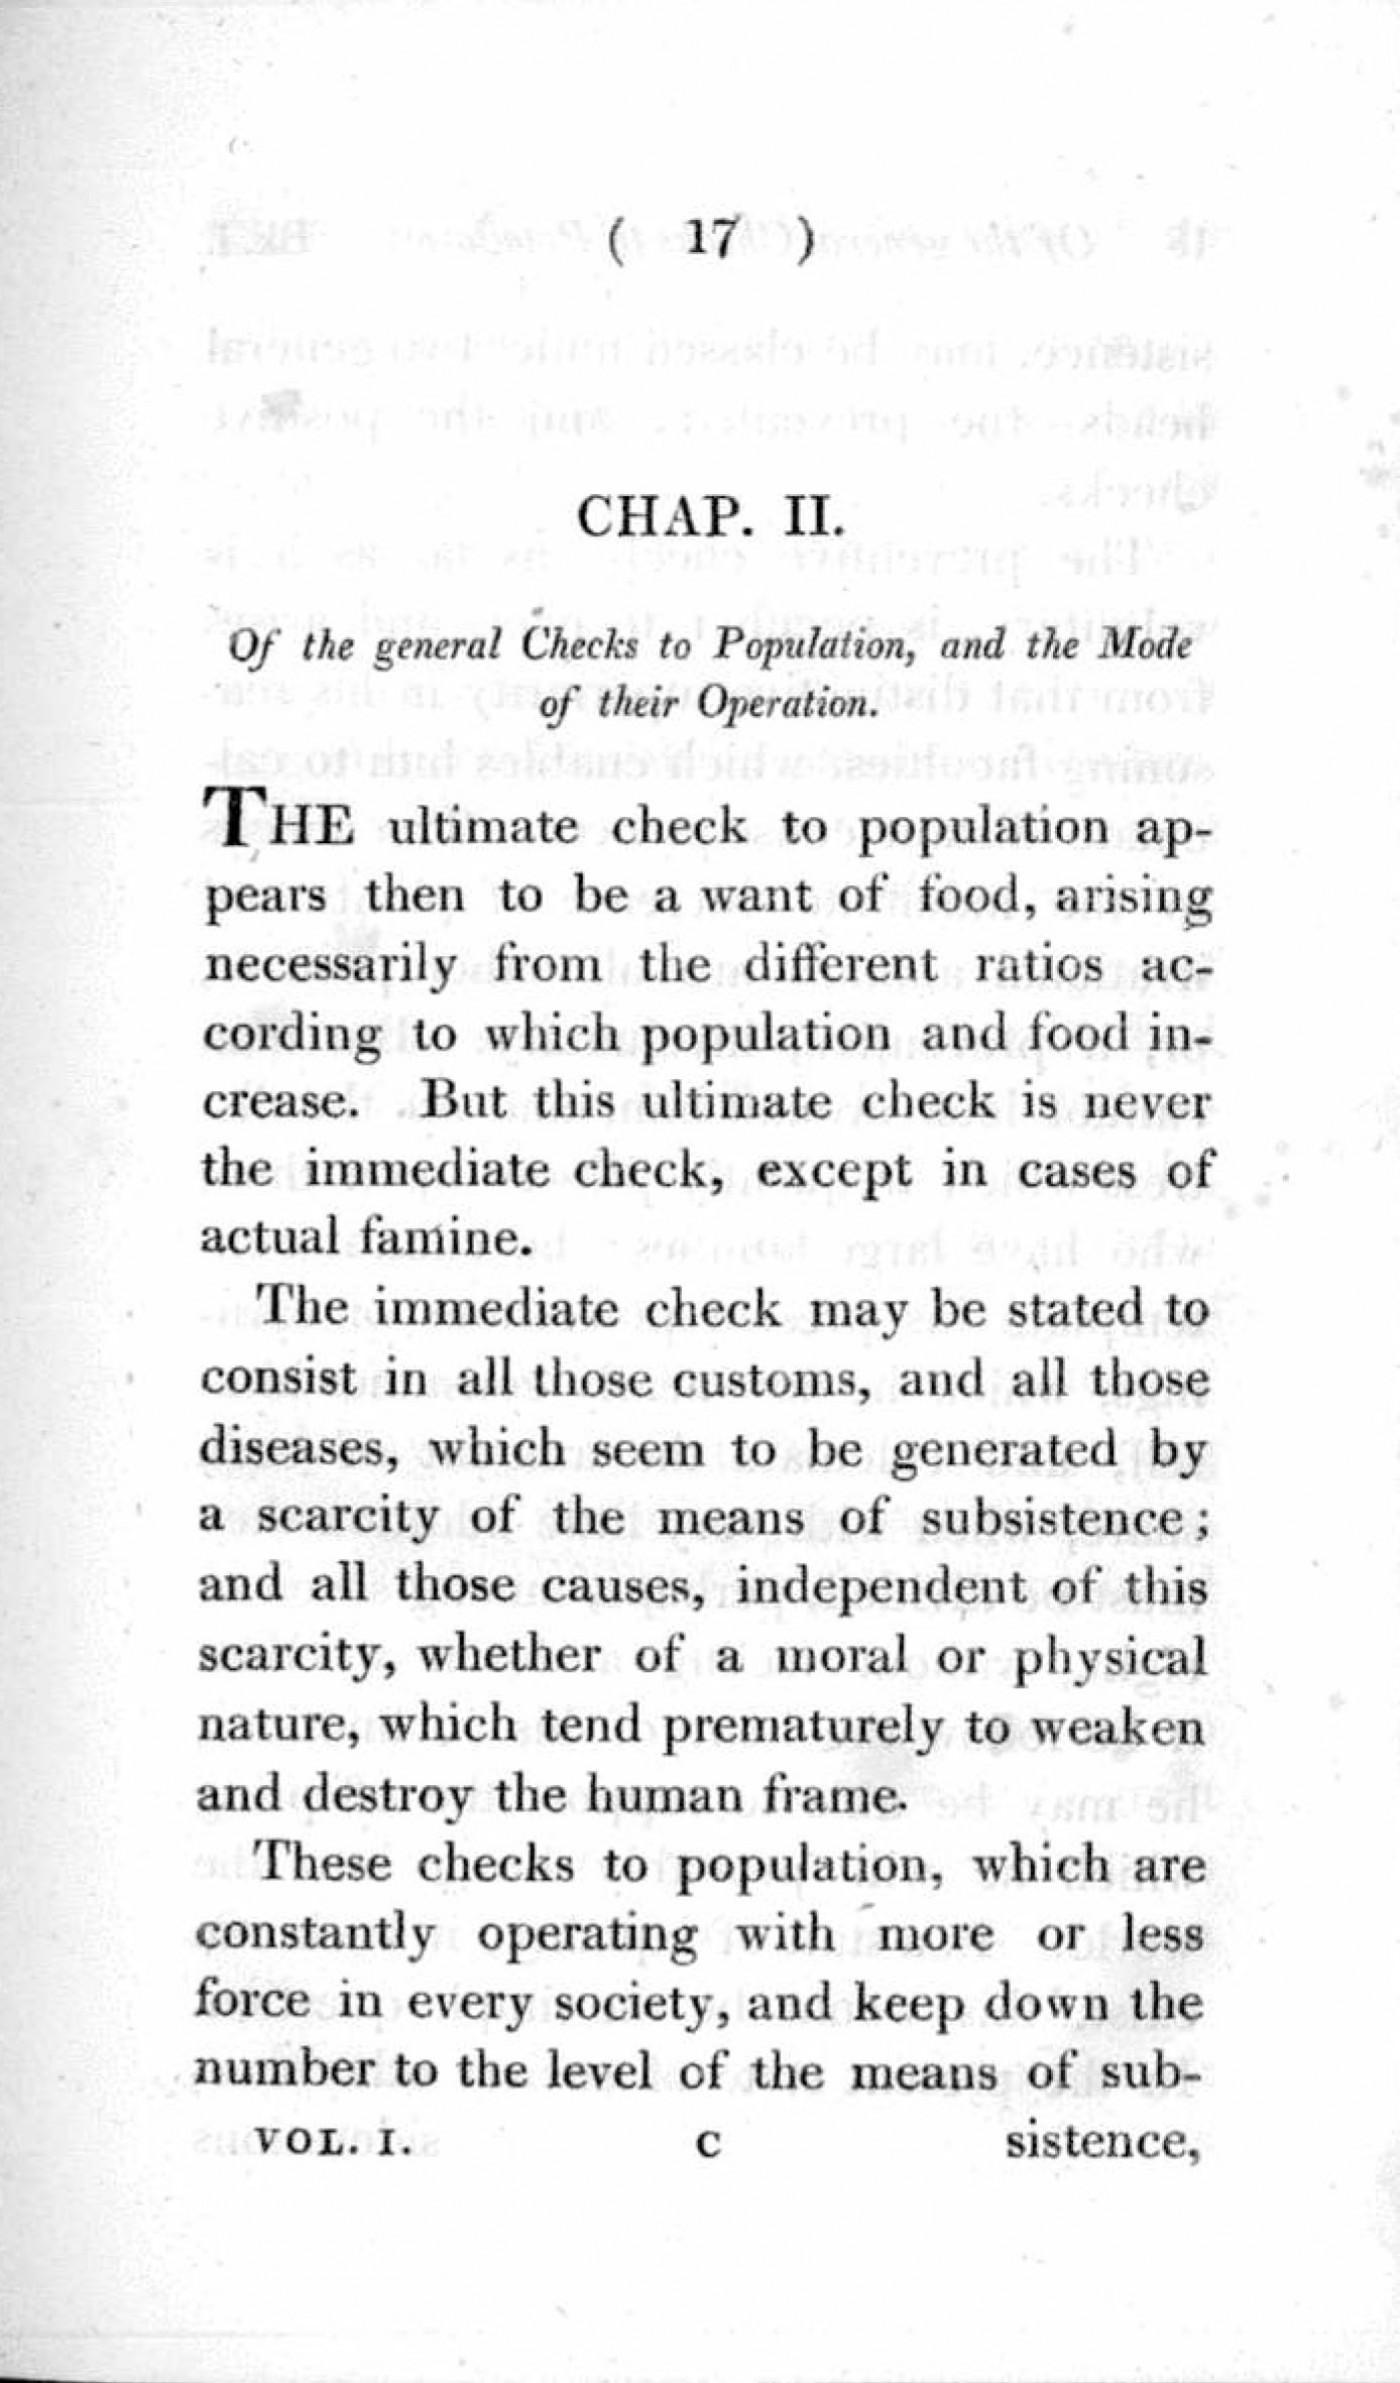 012 Essay Example On The Principle Of Singular Population Malthus Sparknotes Thomas Main Idea 1400